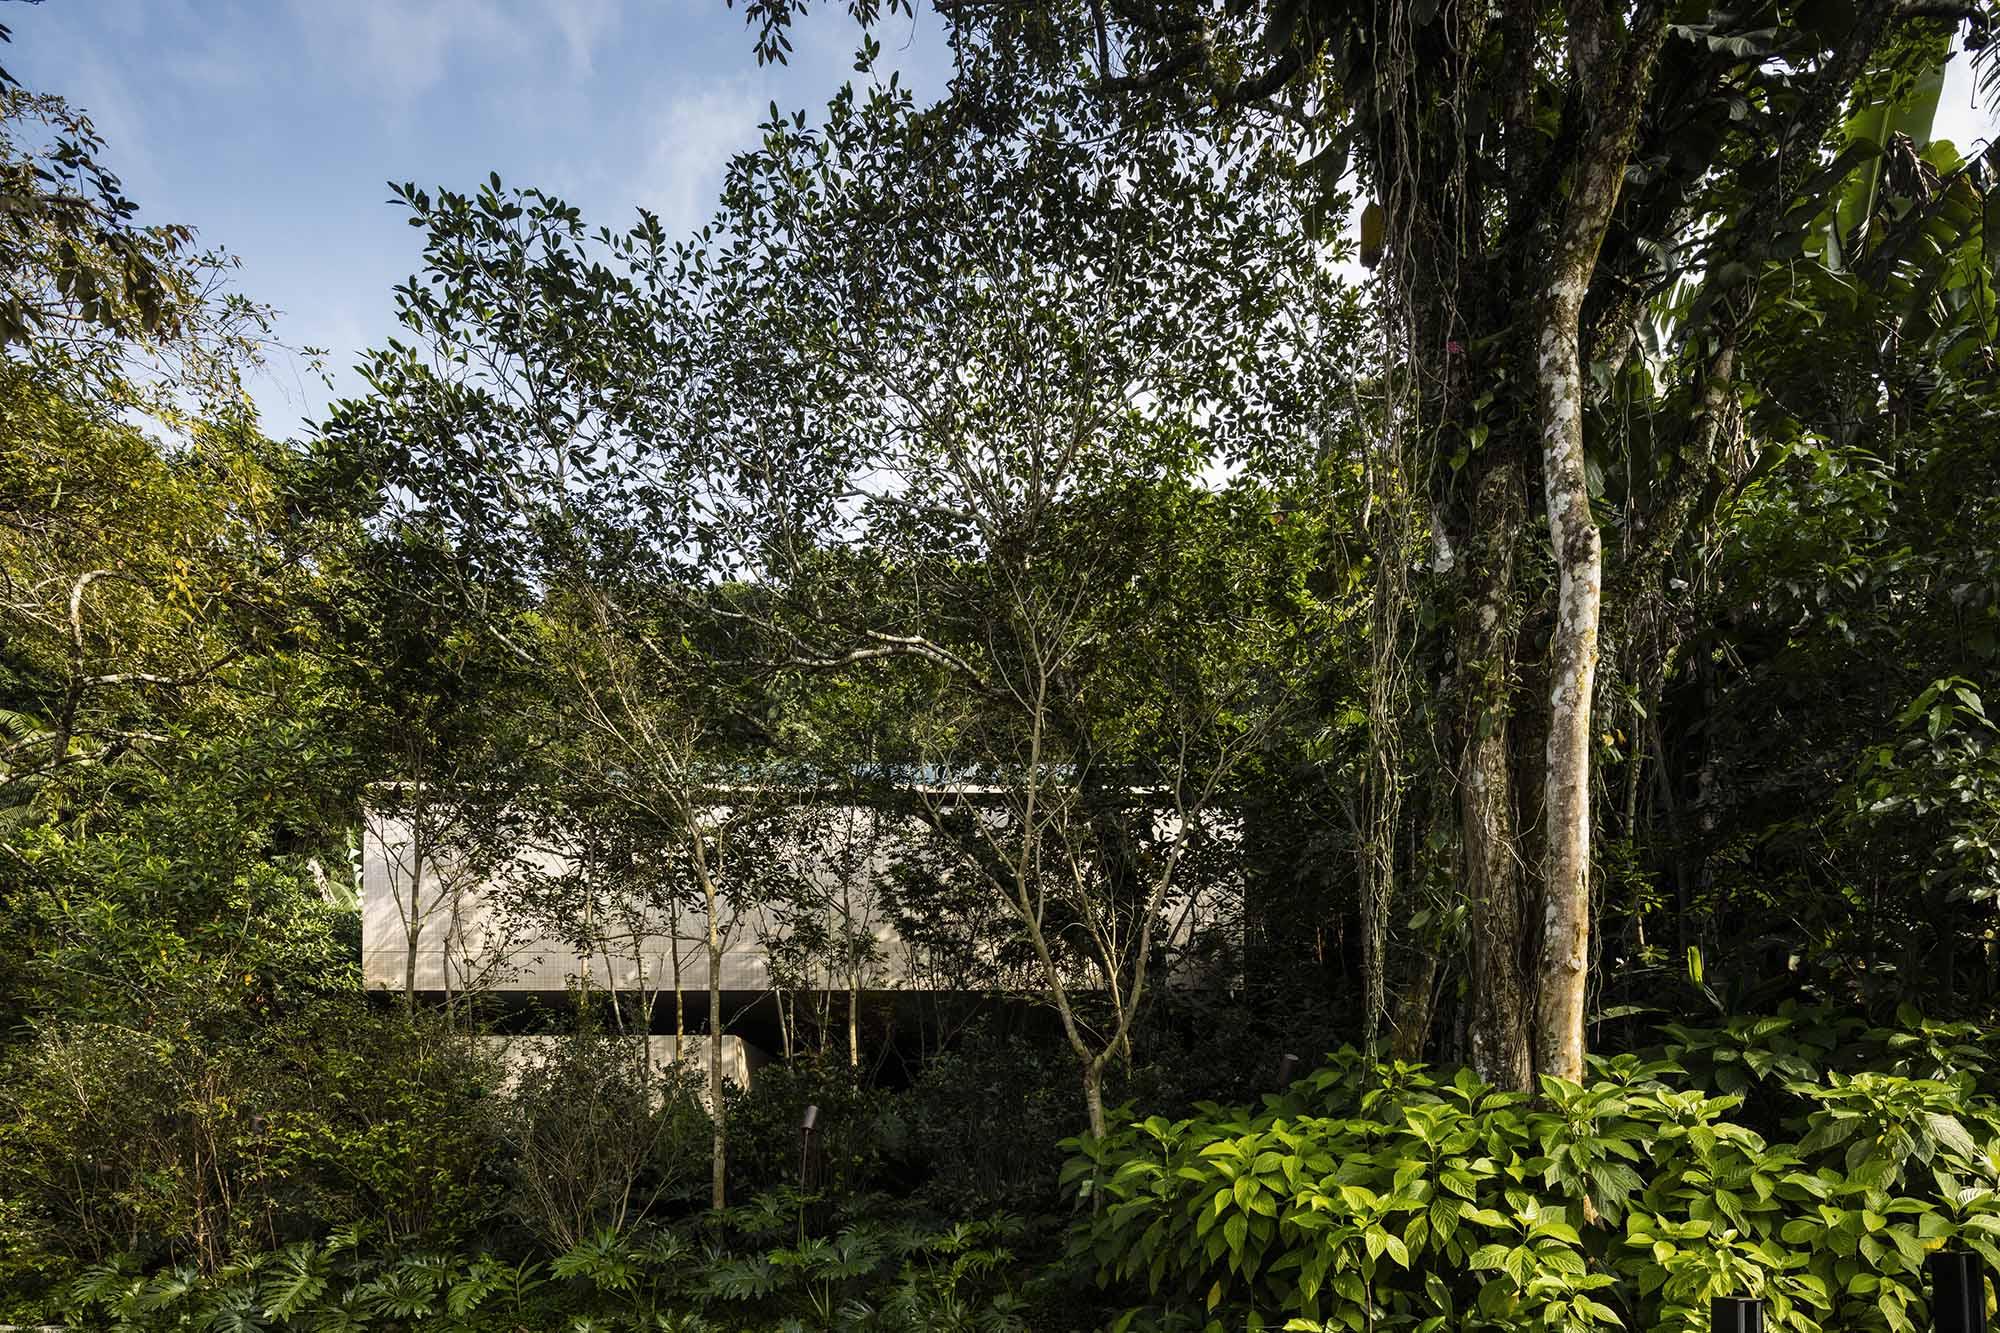 H-House-Life-Jungle-House-Casa-Da-Mata-studio-mk27-mk27_namata_fernandoguerra_medium(1).JPG